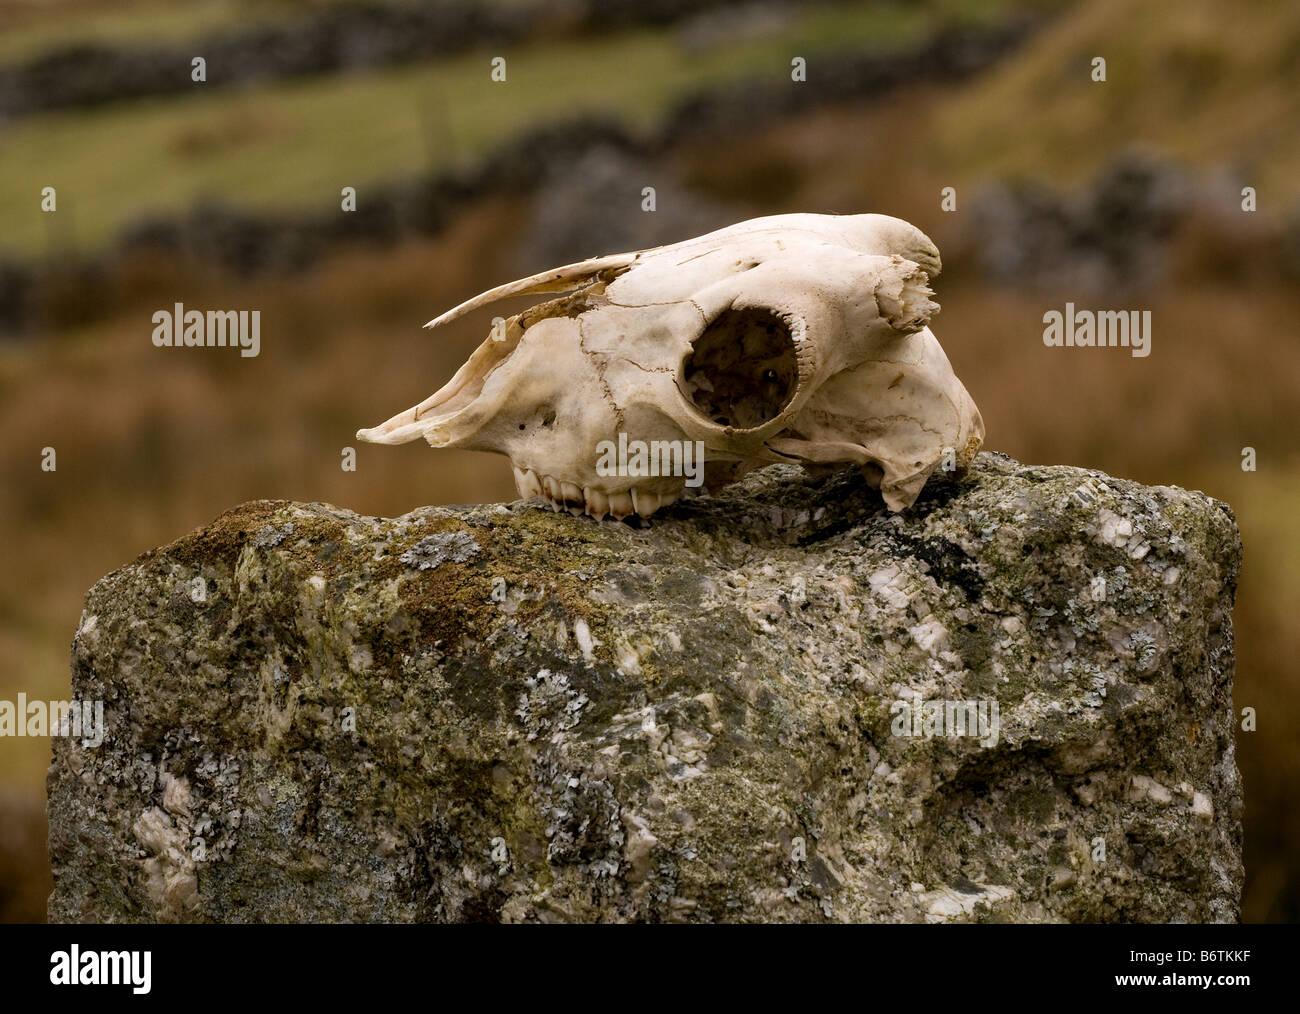 A skull on gatepost on Dartmoor - Stock Image